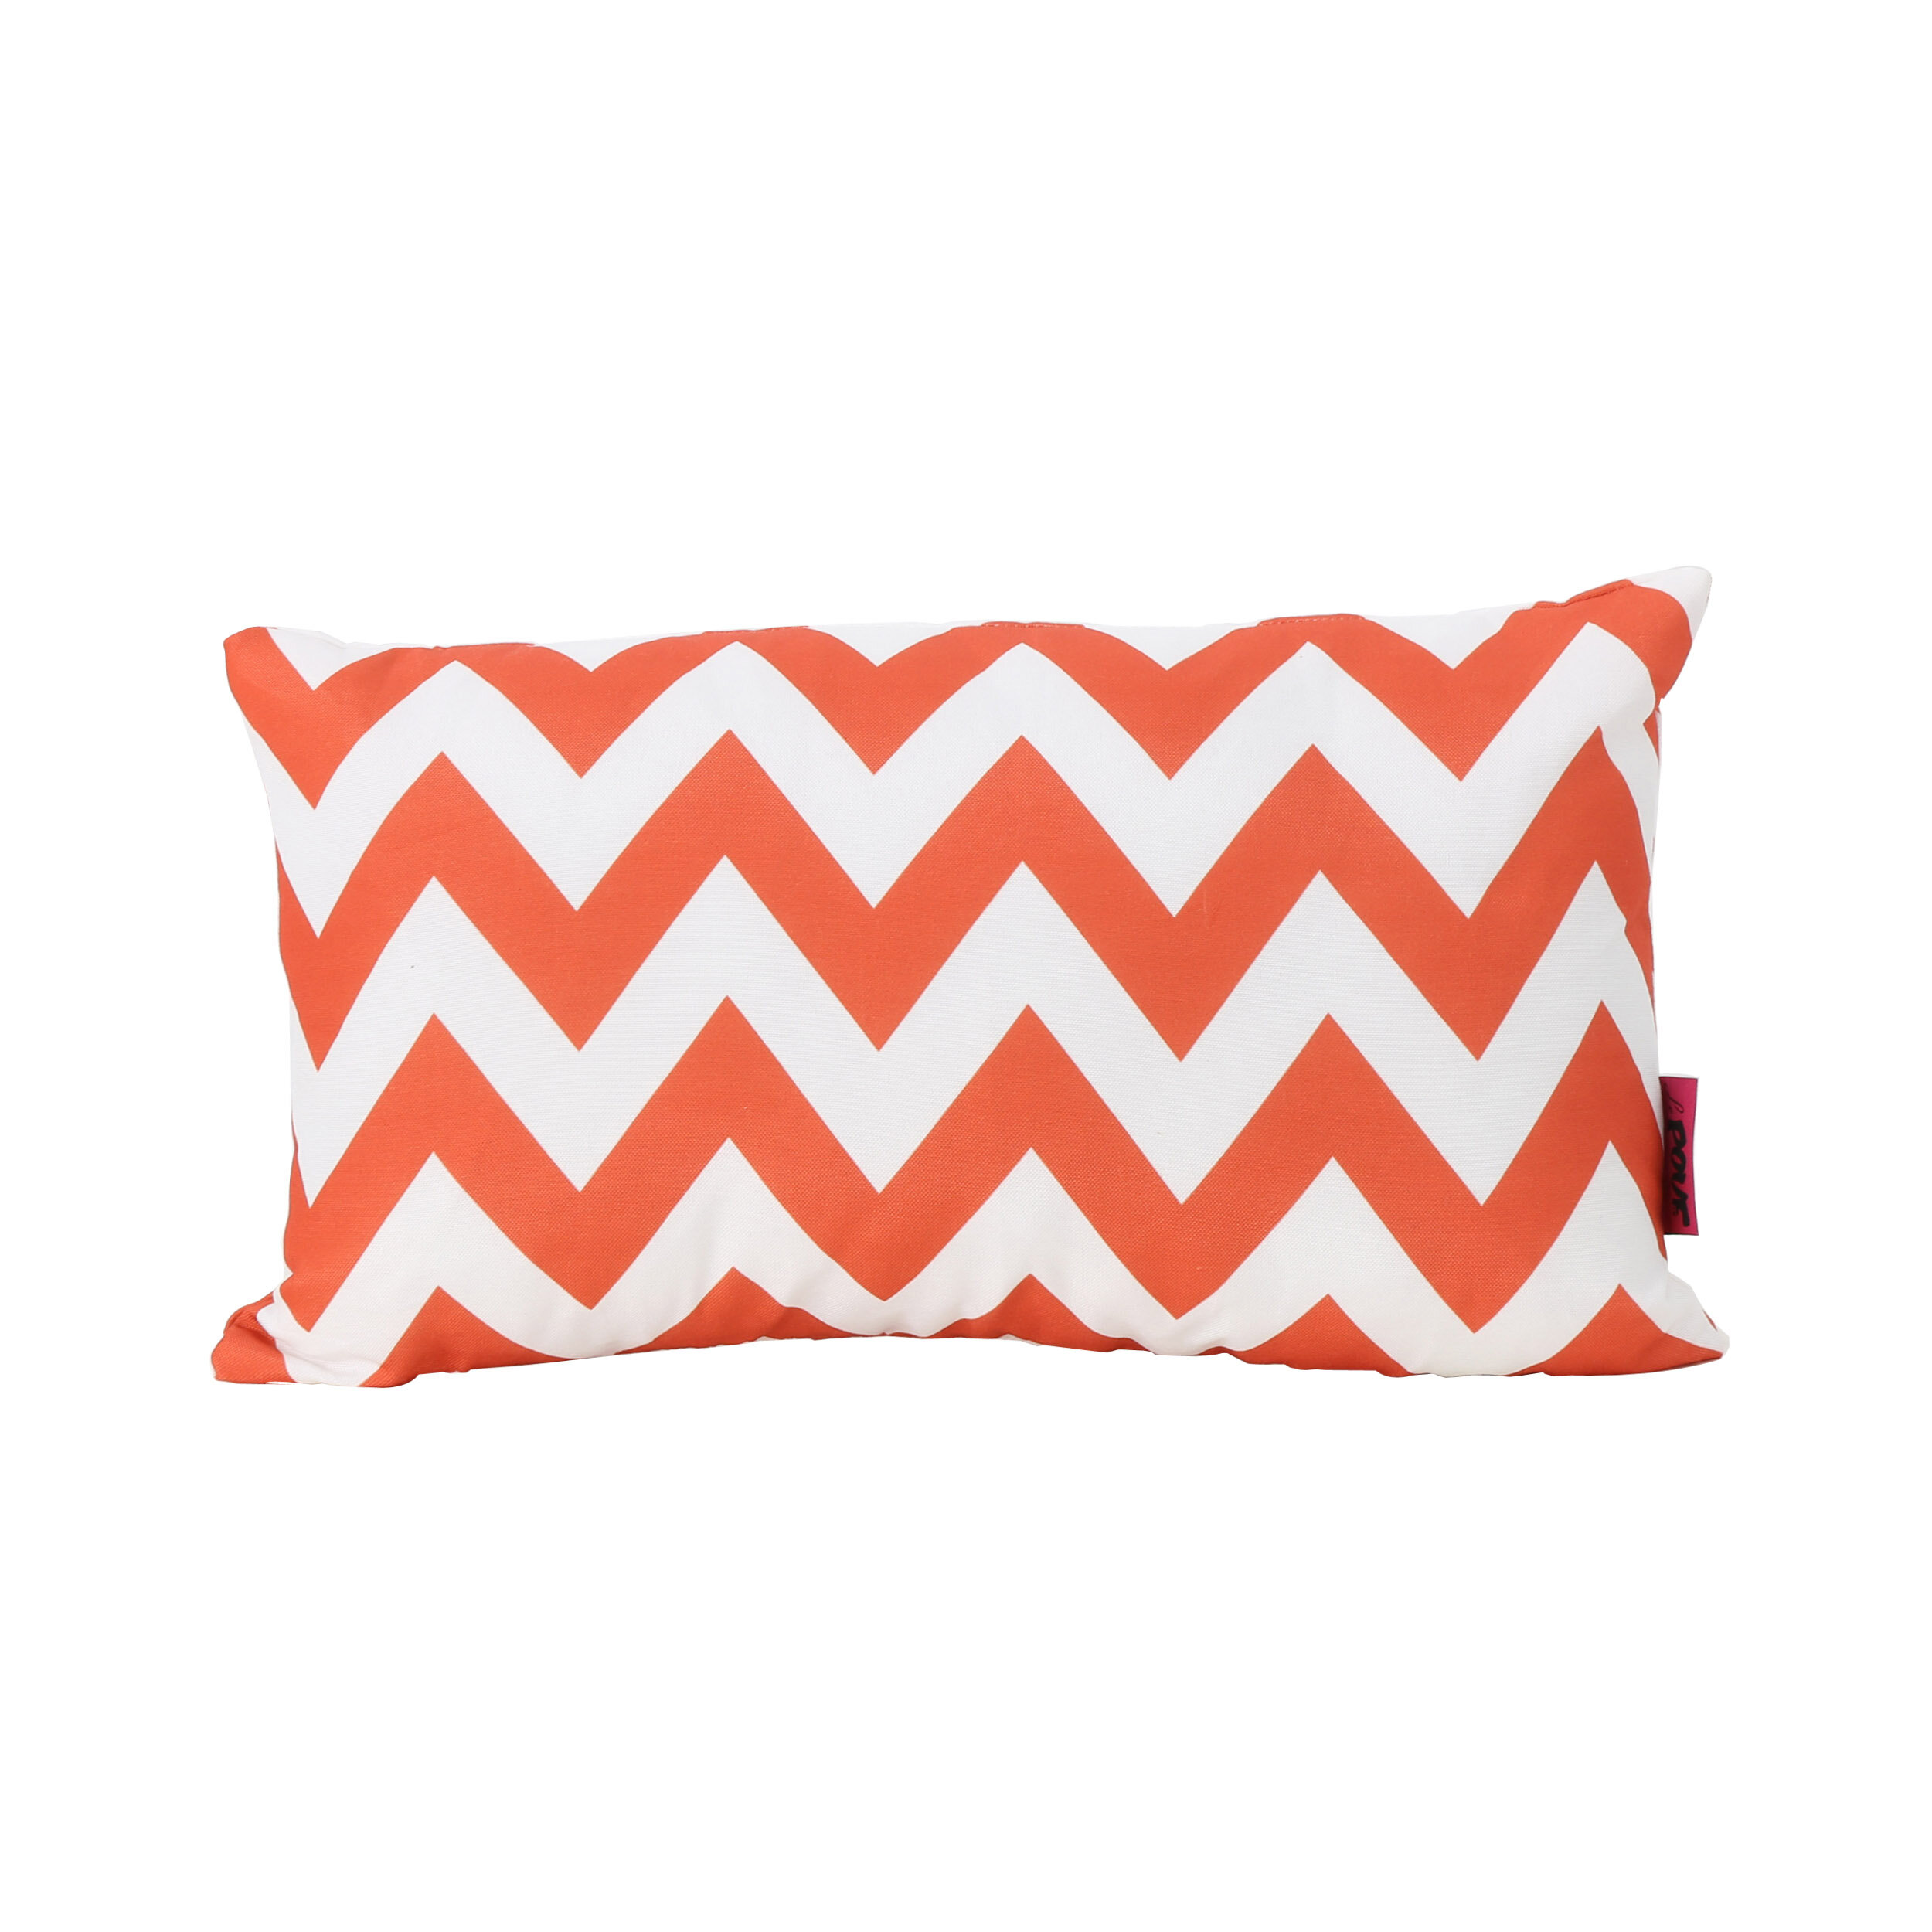 Ebern Designs Mayhew Rectangular Outdoor Lumbar Pillow Reviews Wayfair